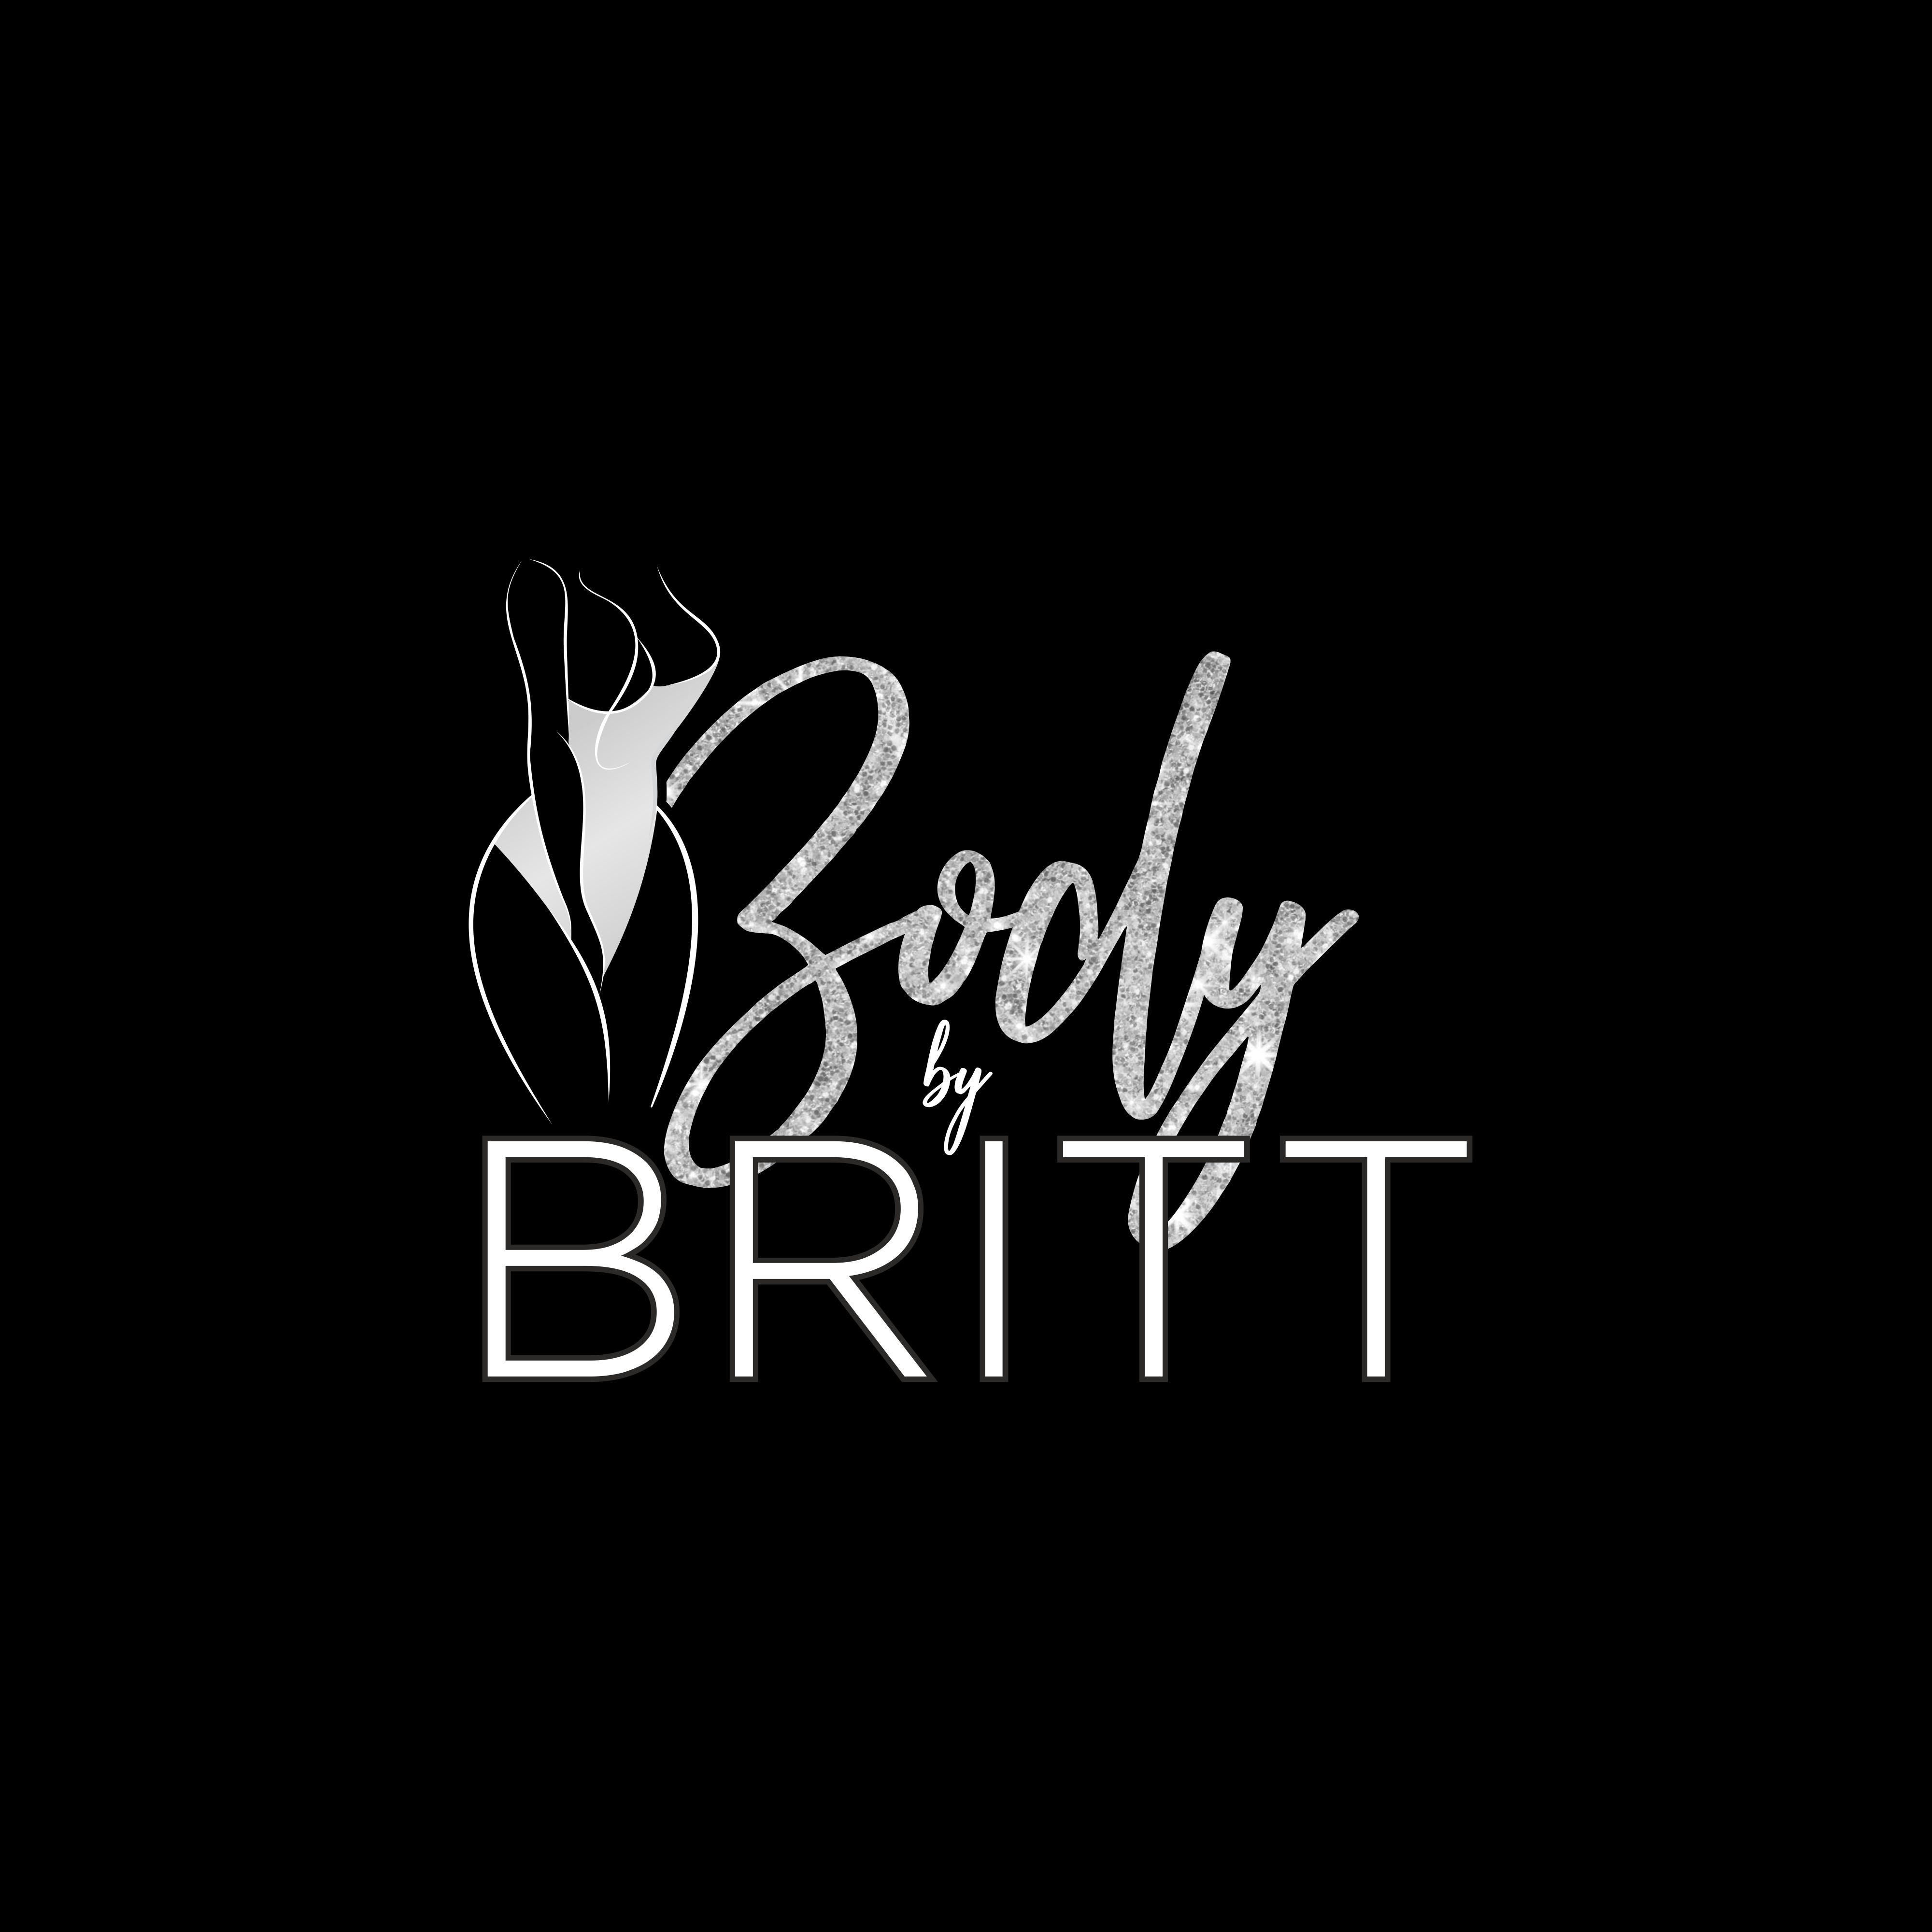 Body by Britt